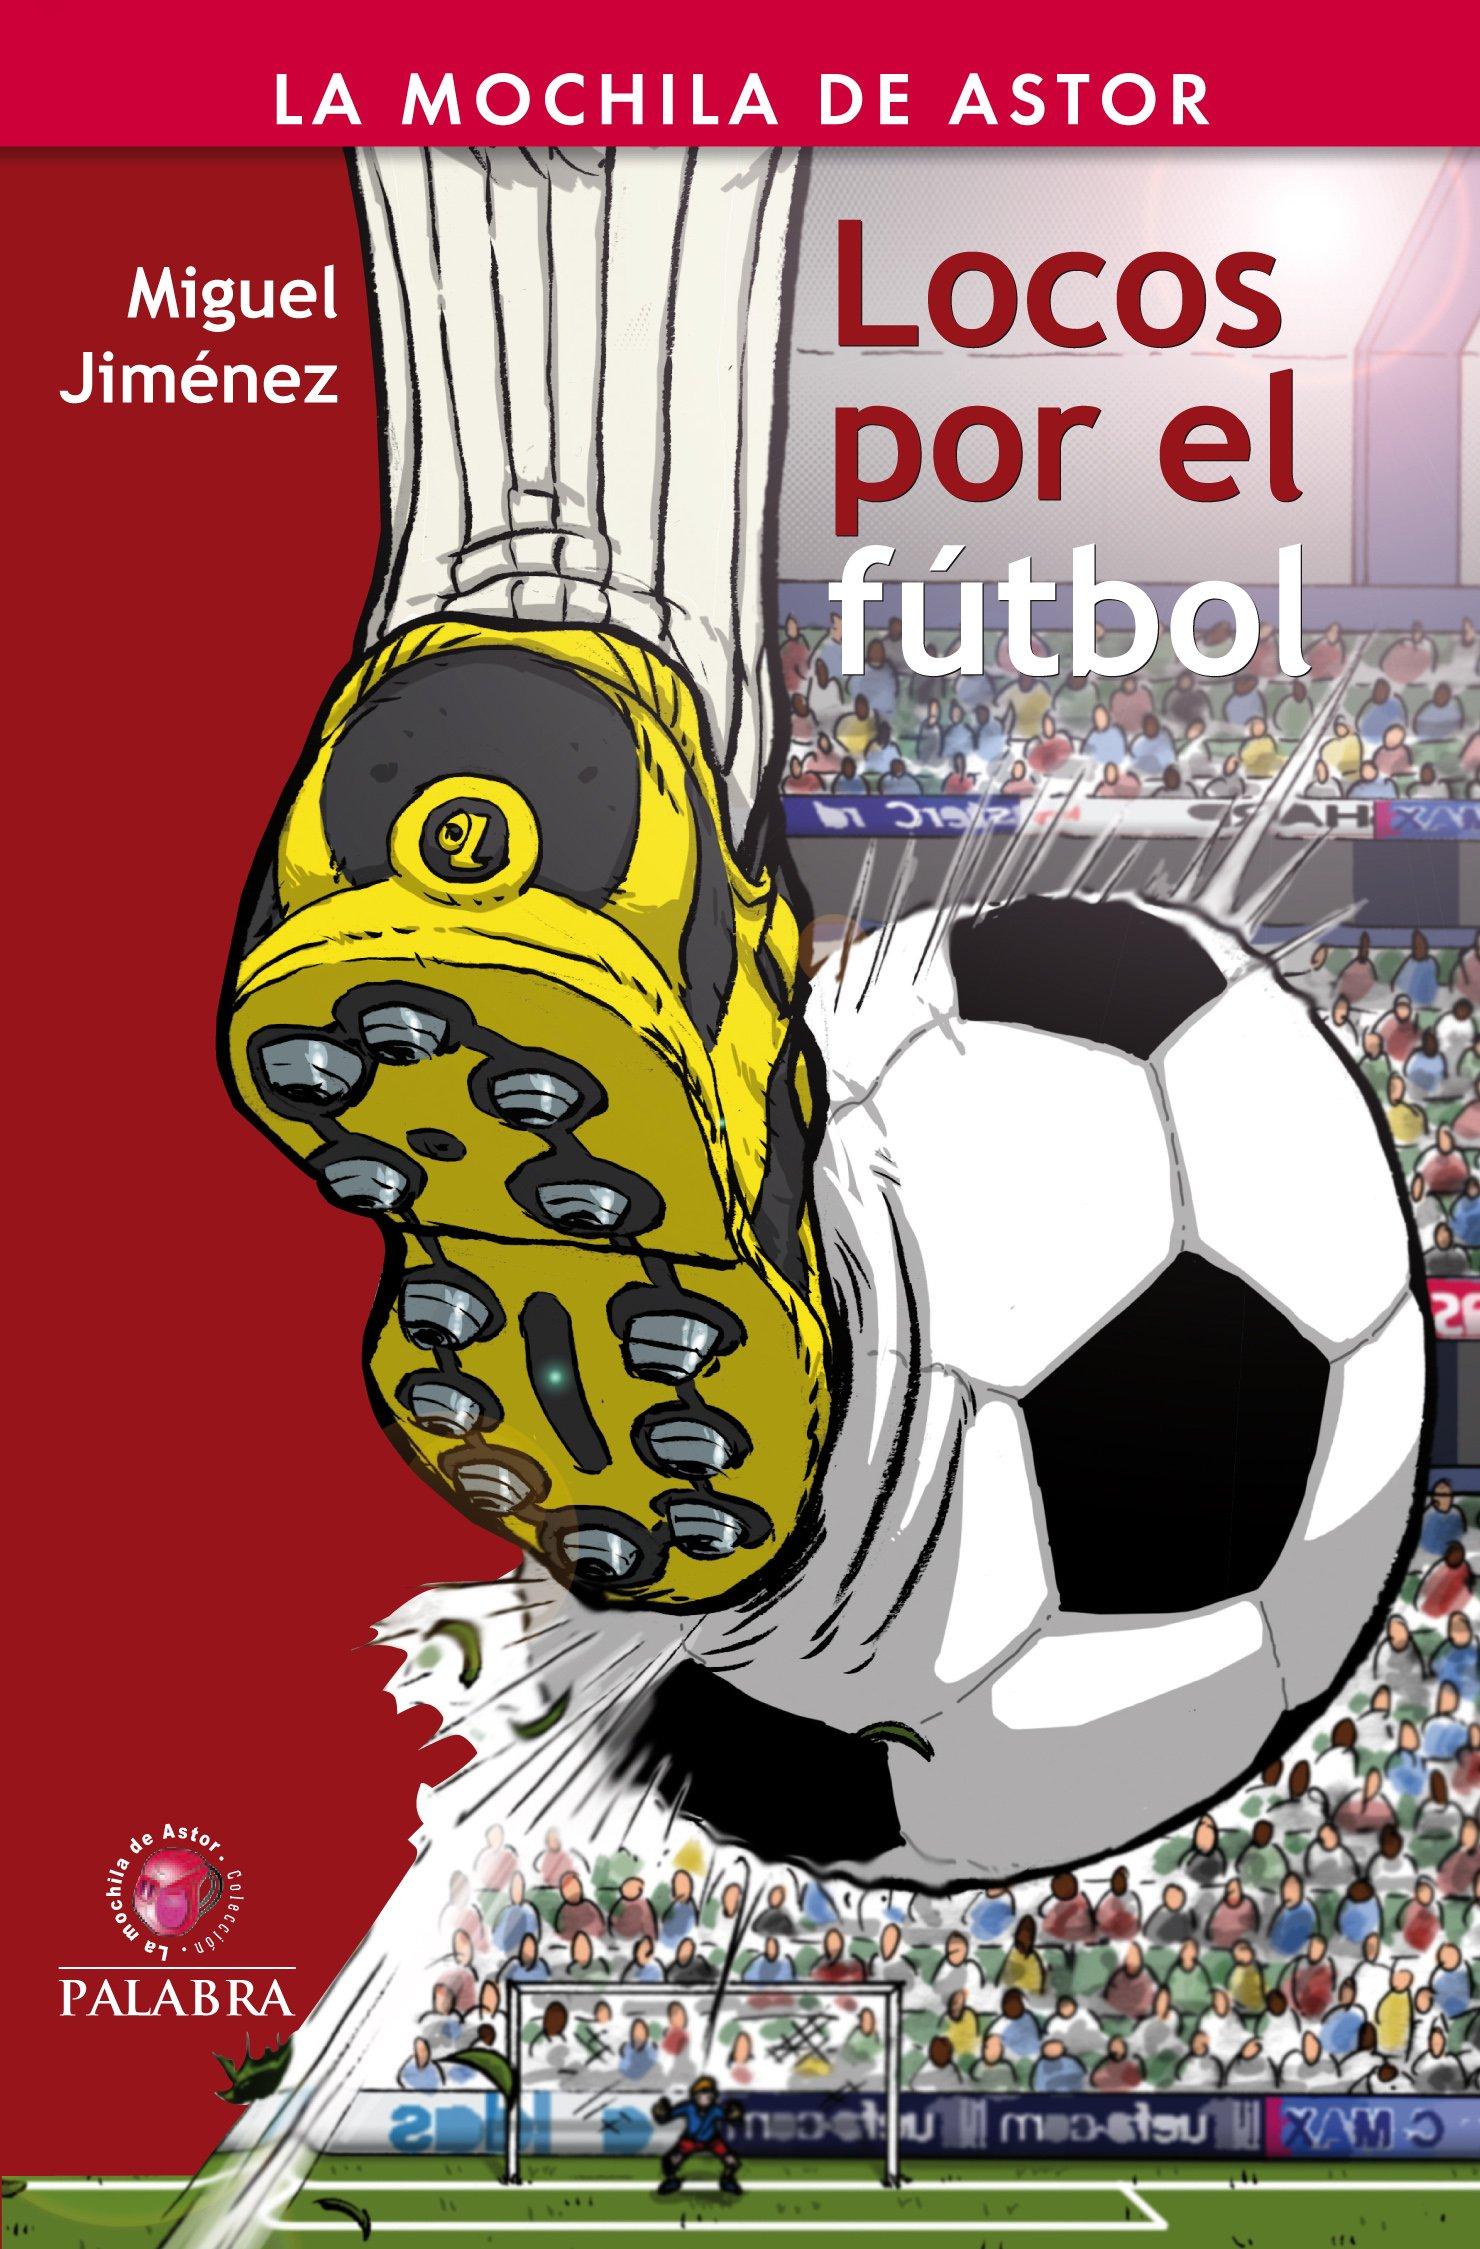 Locos por el fútbol (Spanish) Paperback – September 25, 2012